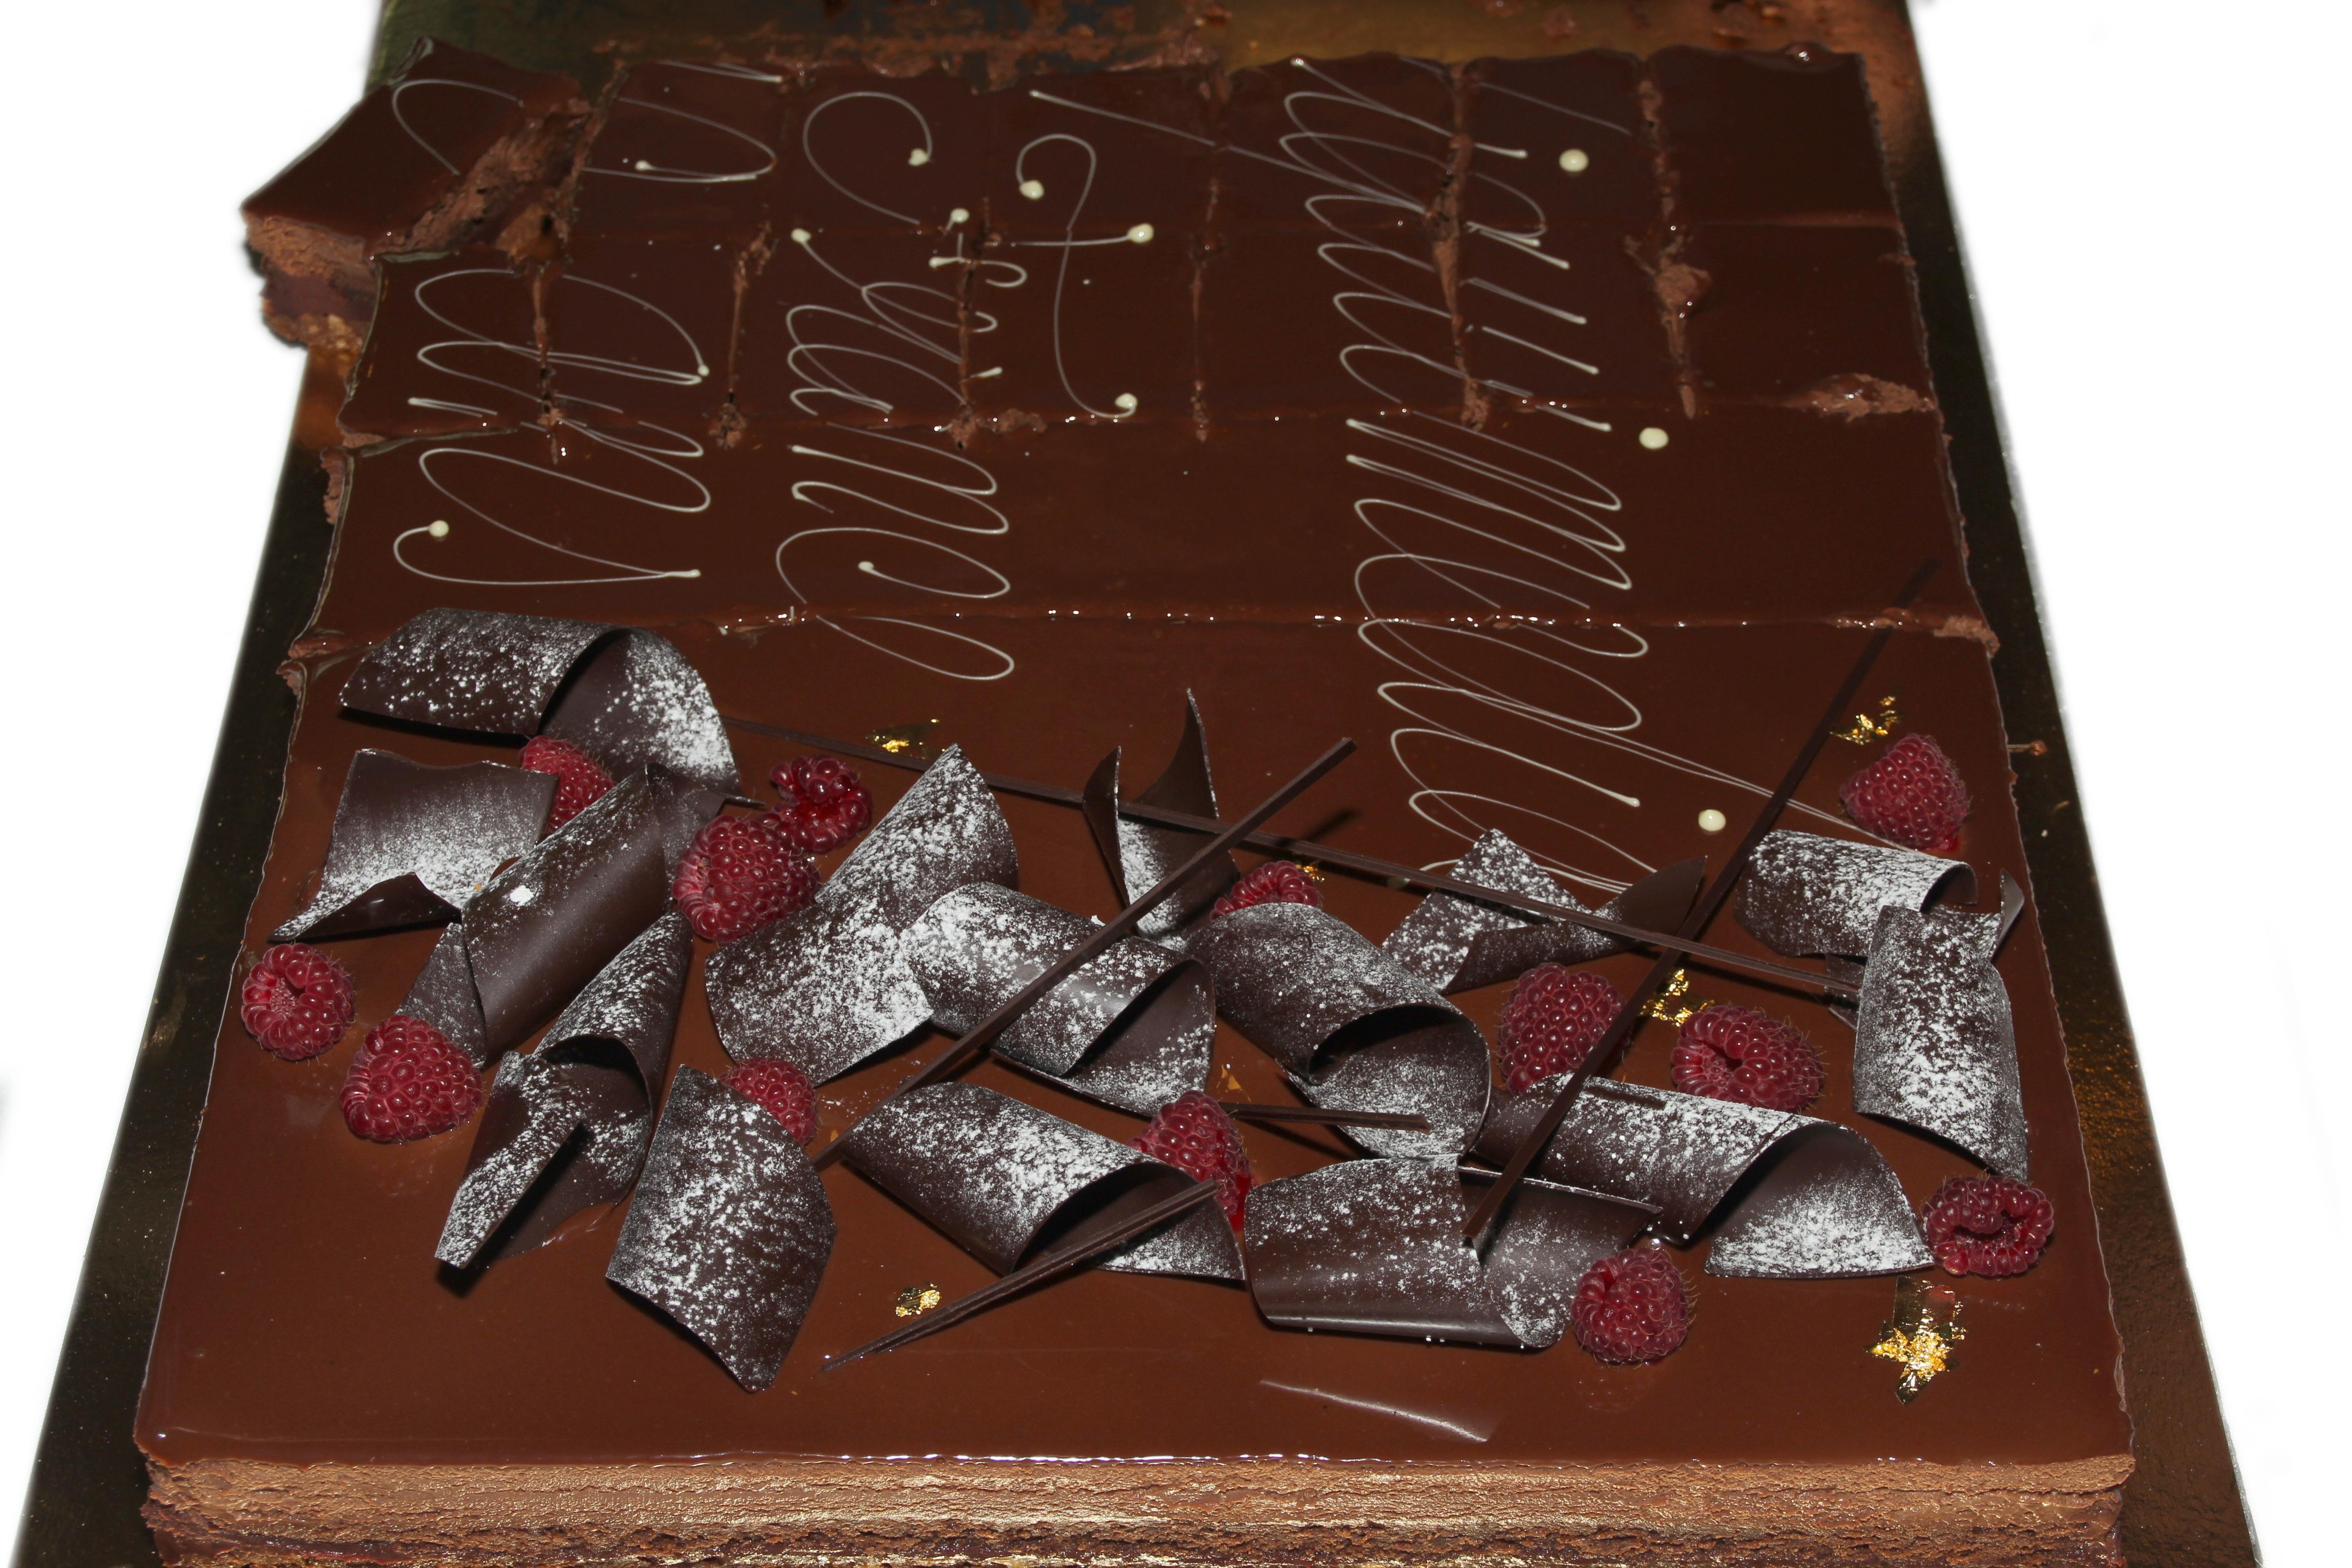 Filegateau Au Chocolat 1jpg Wikimedia Commons